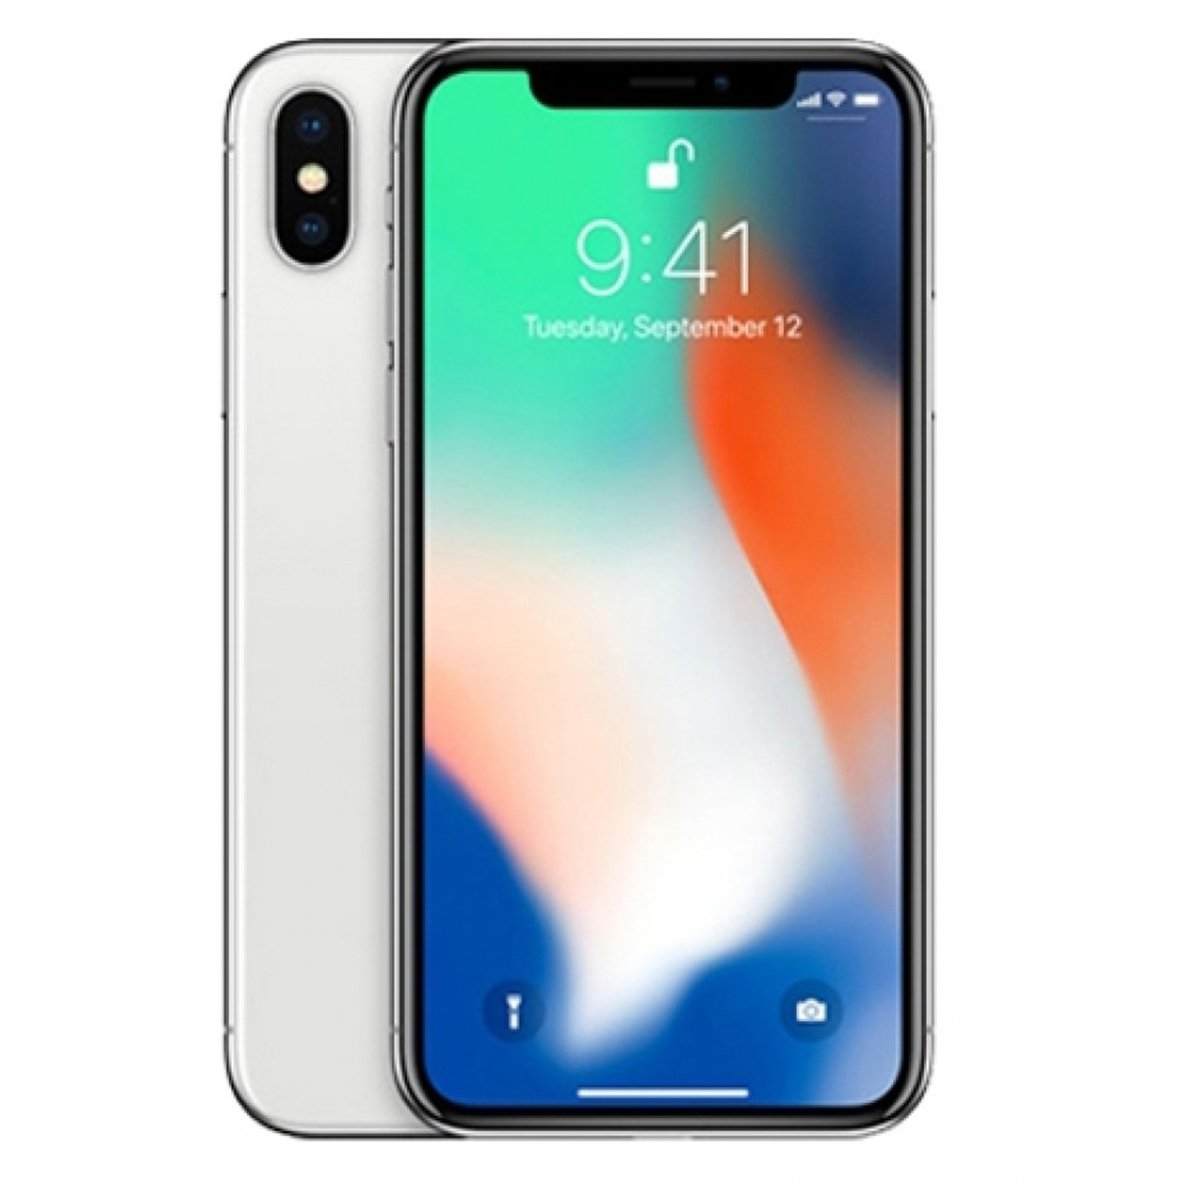 Apple Iphone X Price In Pakistan 2021 Priceoye